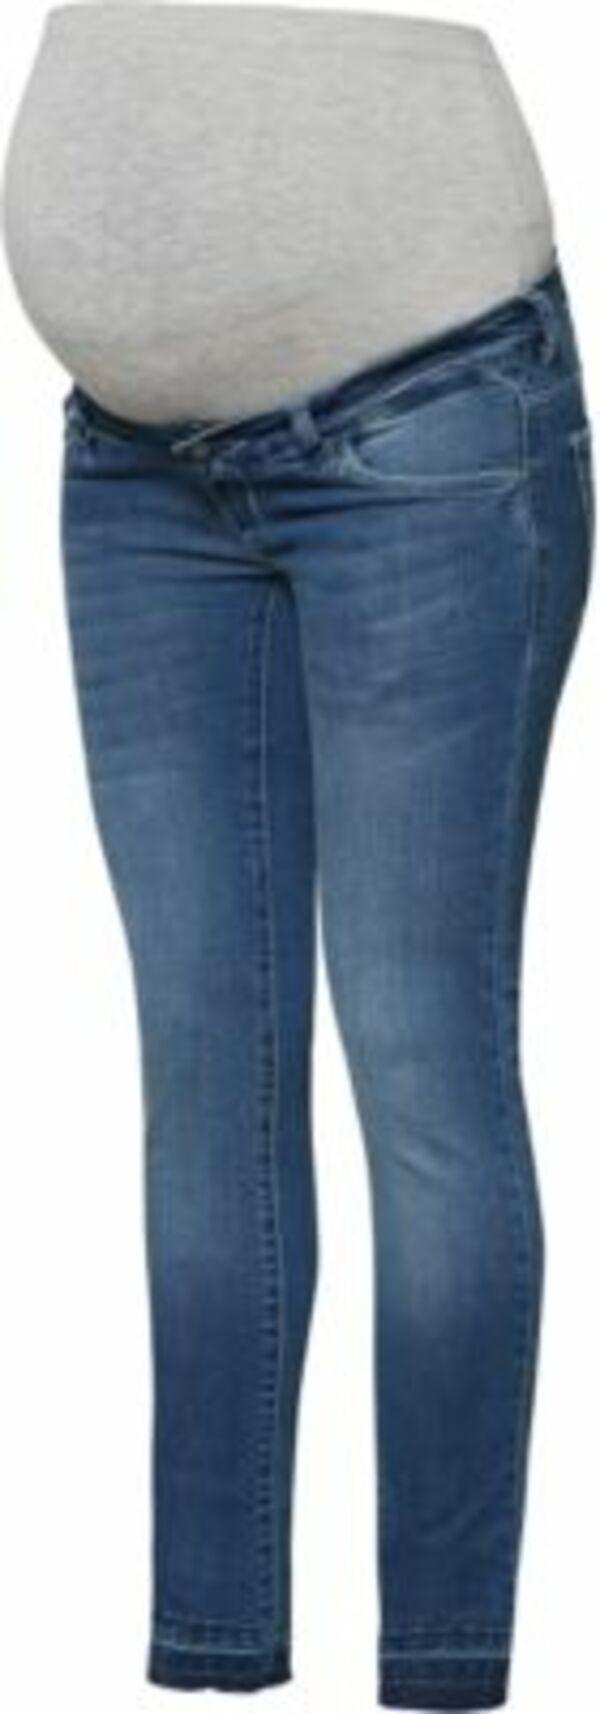 Umstandsjeans MLULRIKA, slim dark blue denim Gr. W28/L34 Damen Kinder